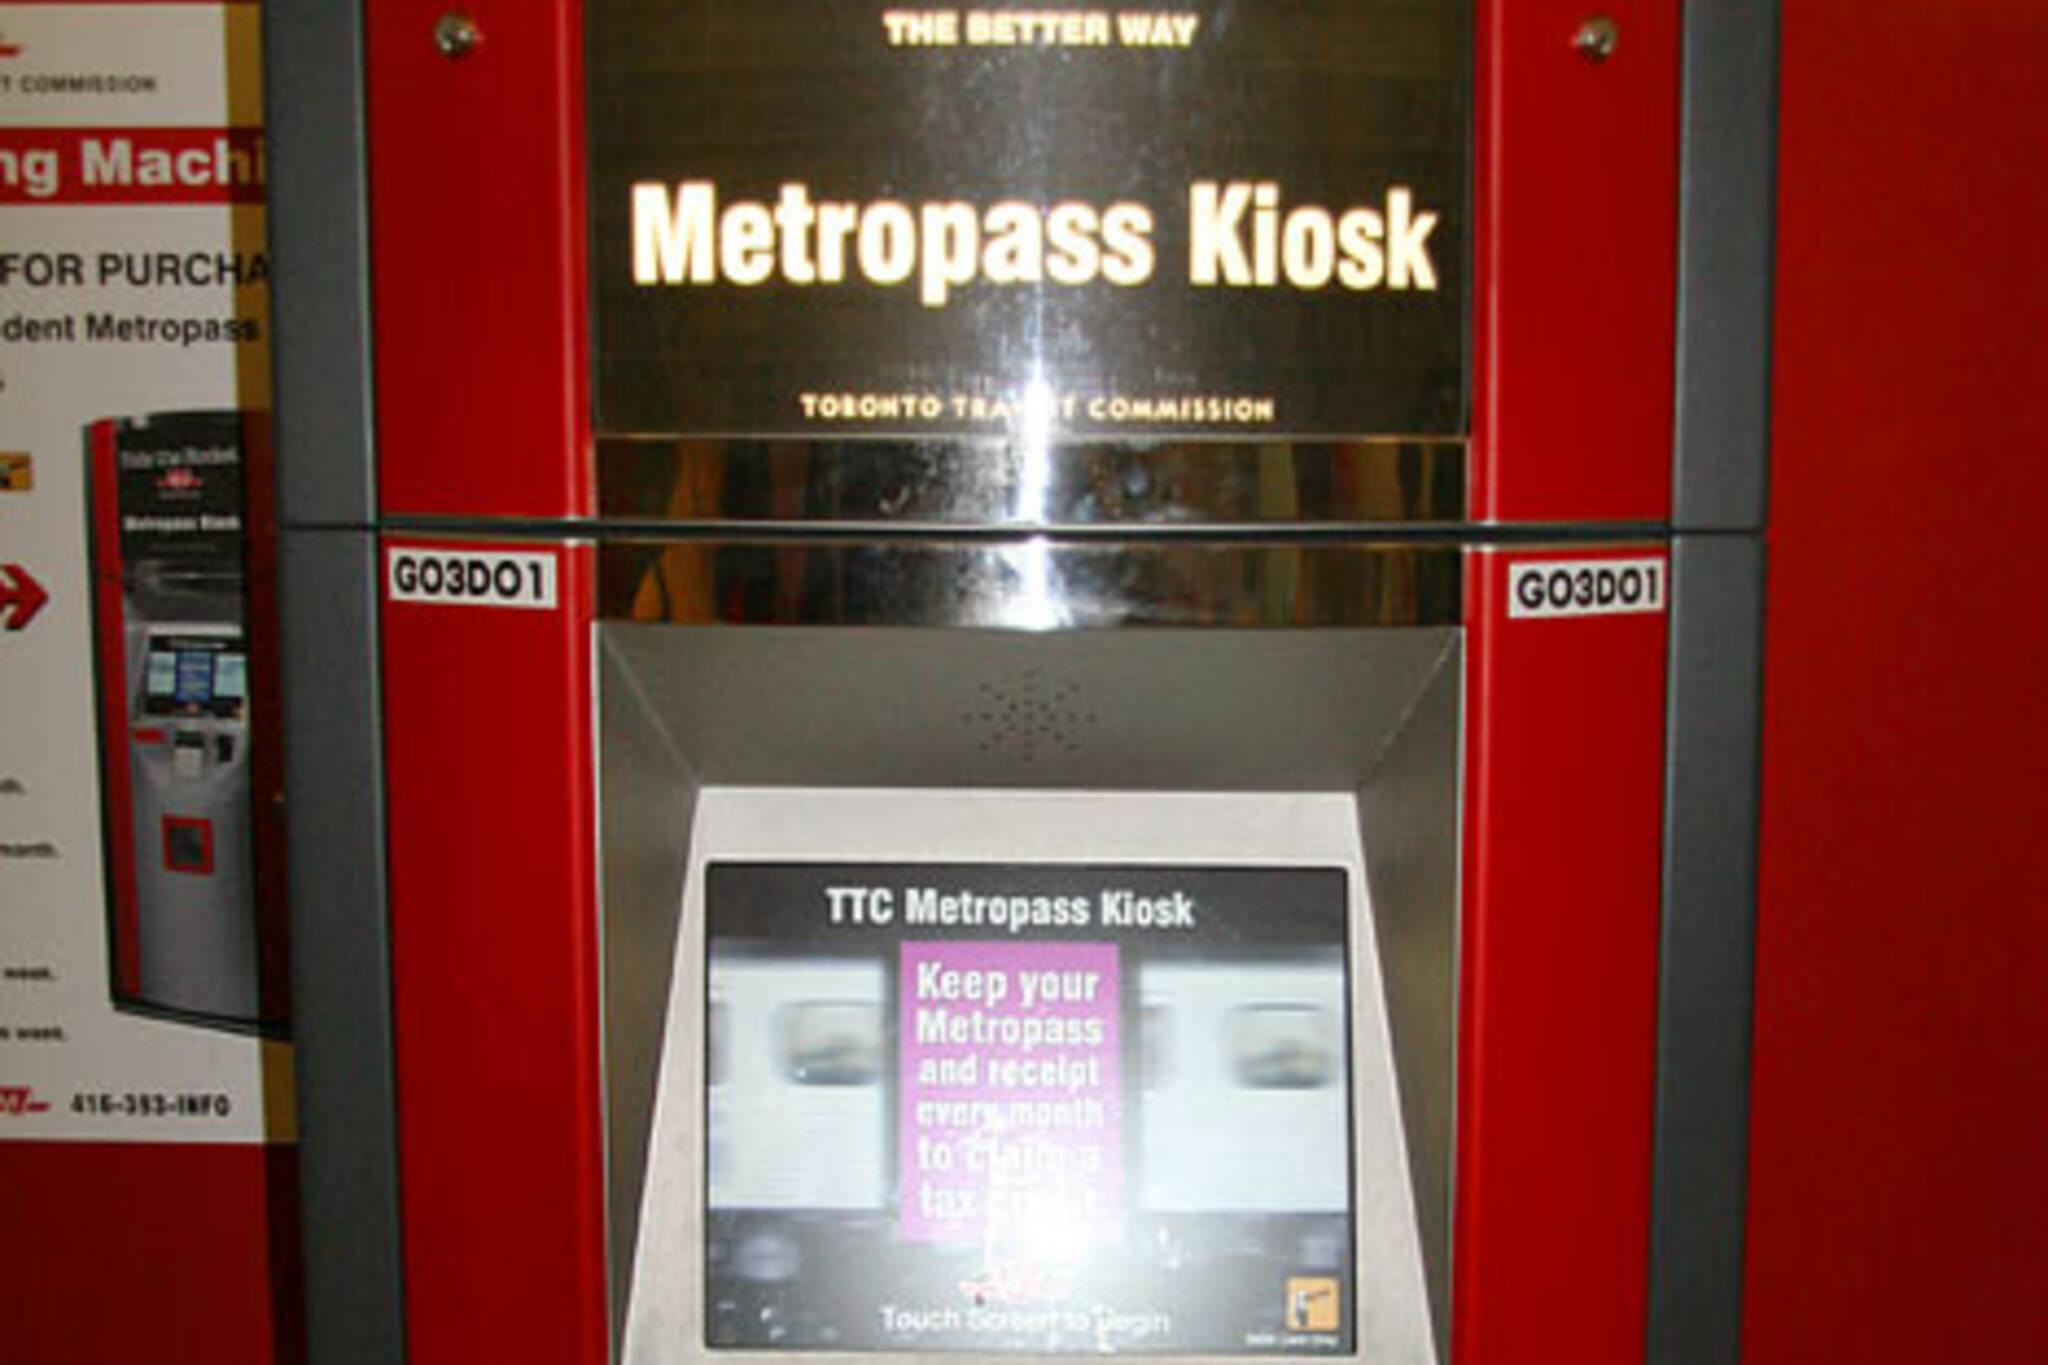 TTC Metropass Kiosk